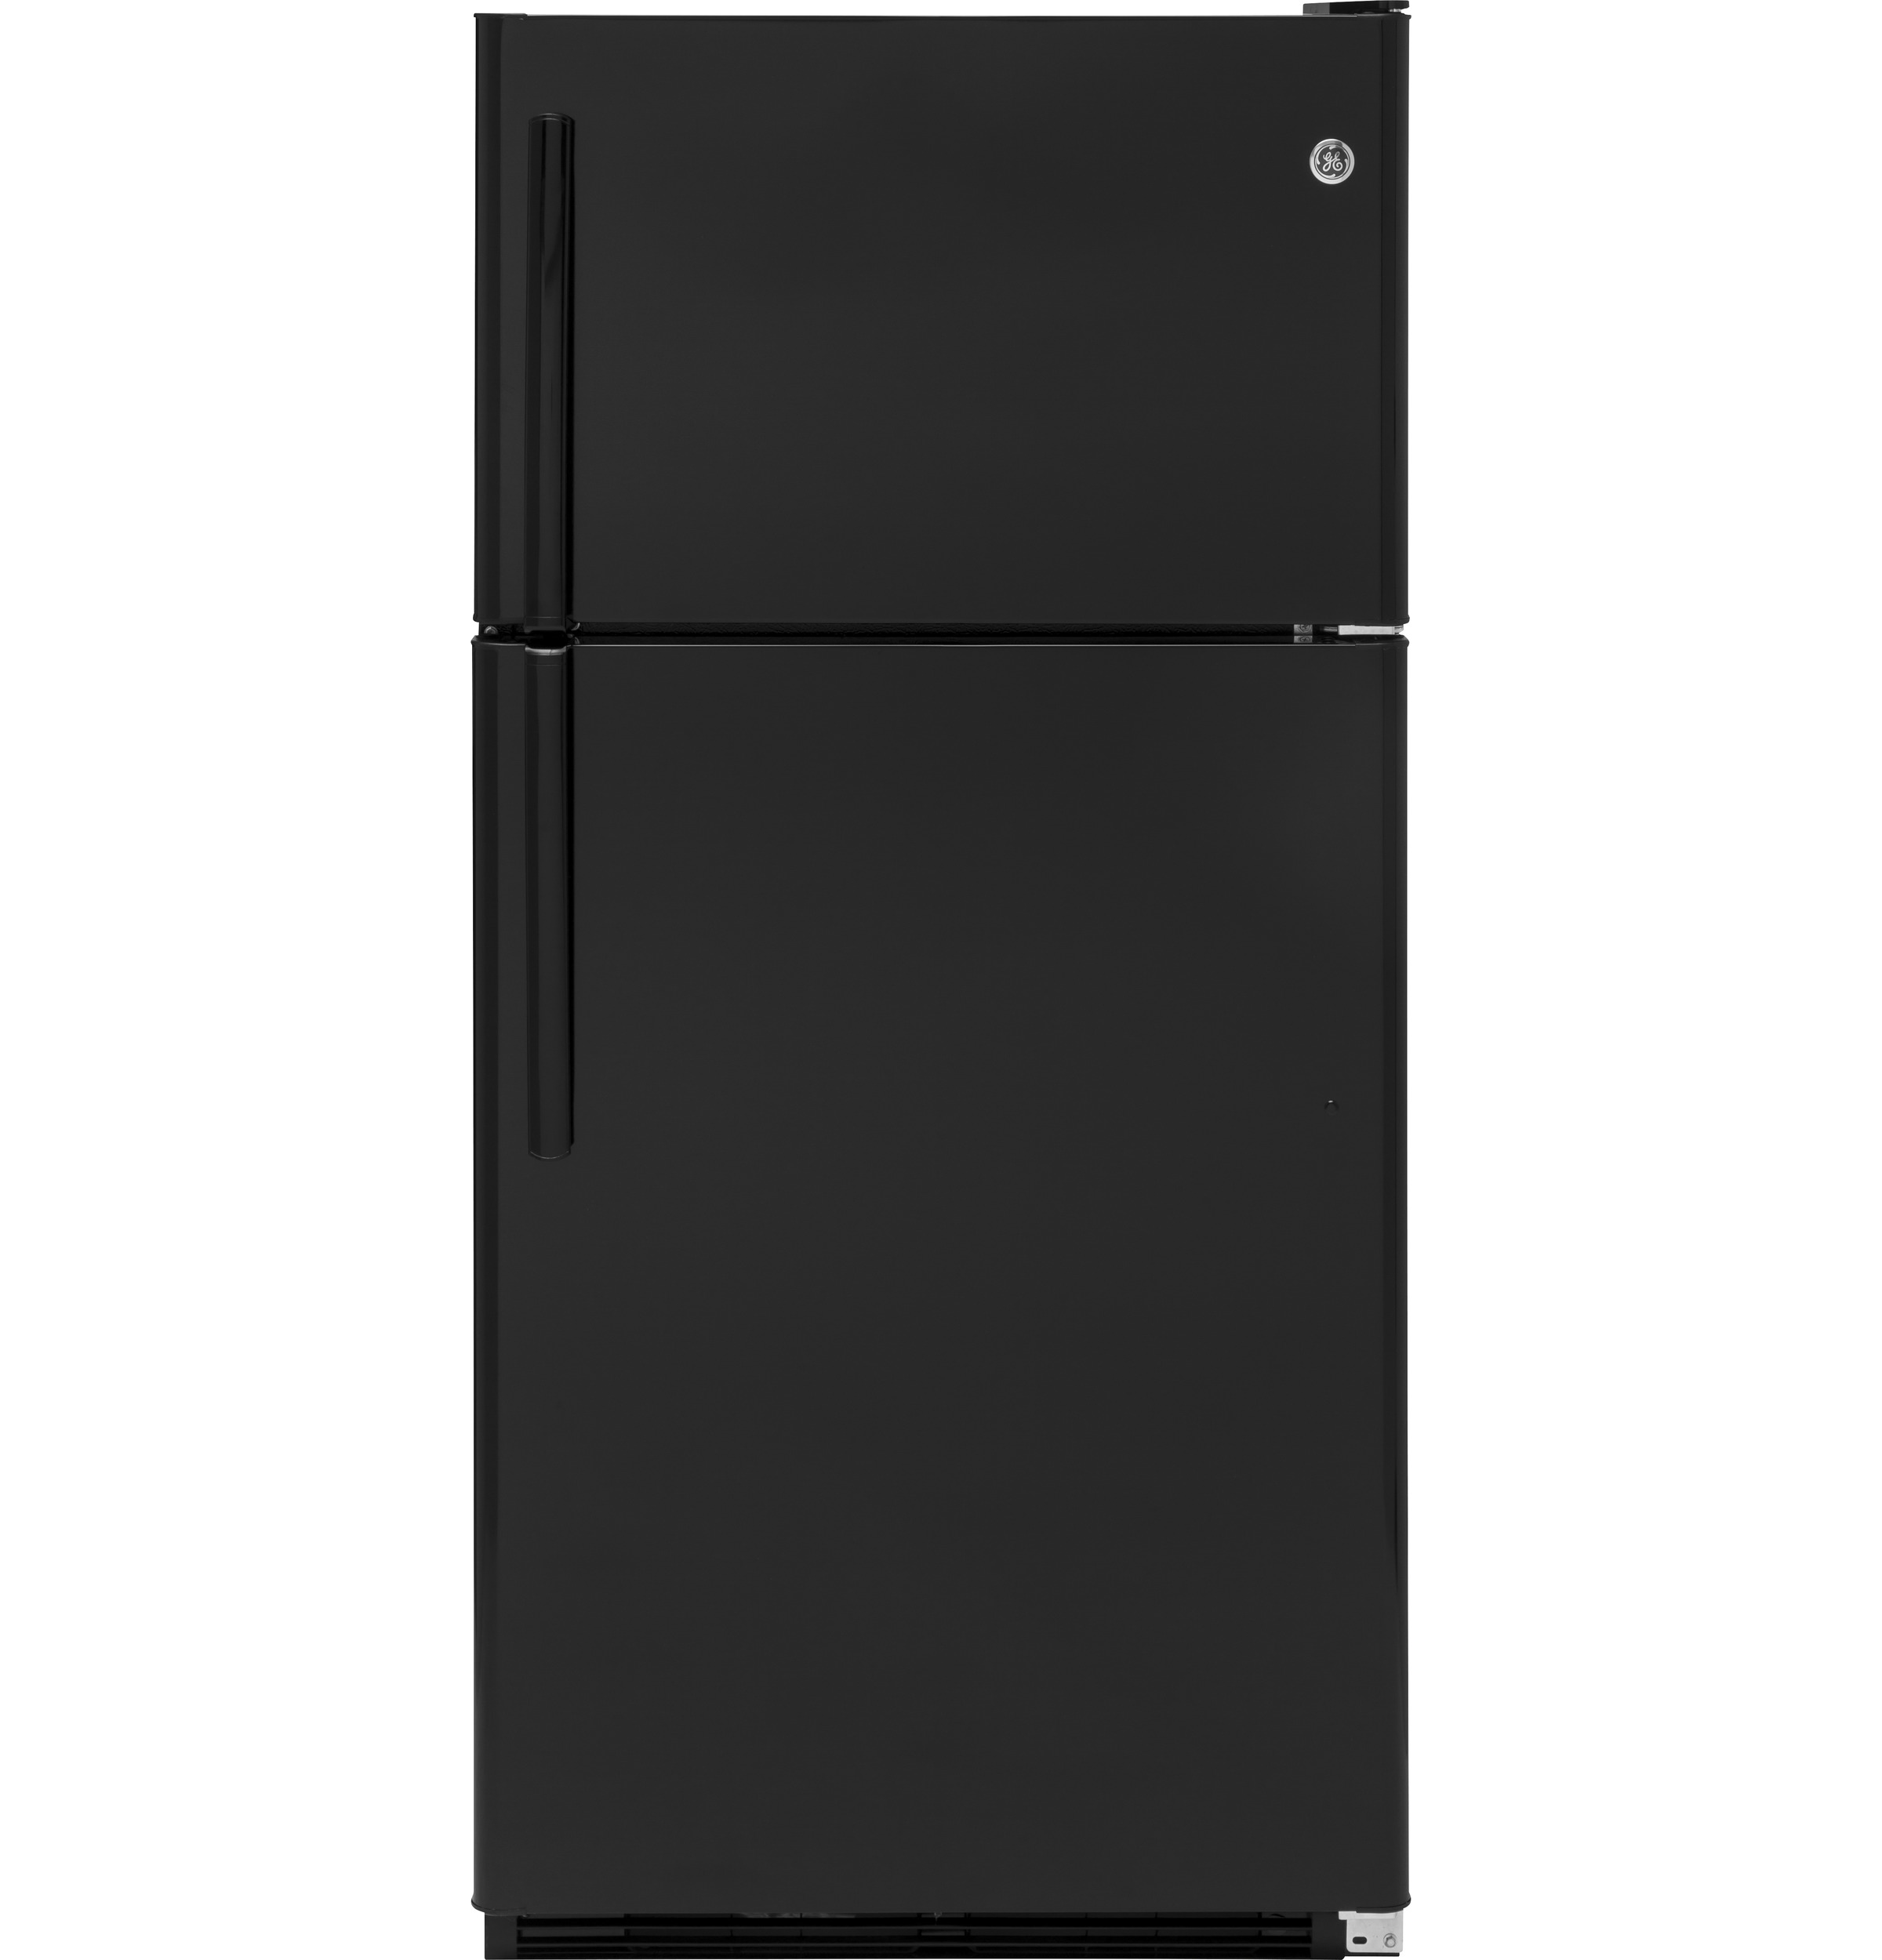 GE GE® 20.8 Cu. Ft. Top-Freezer Refrigerator